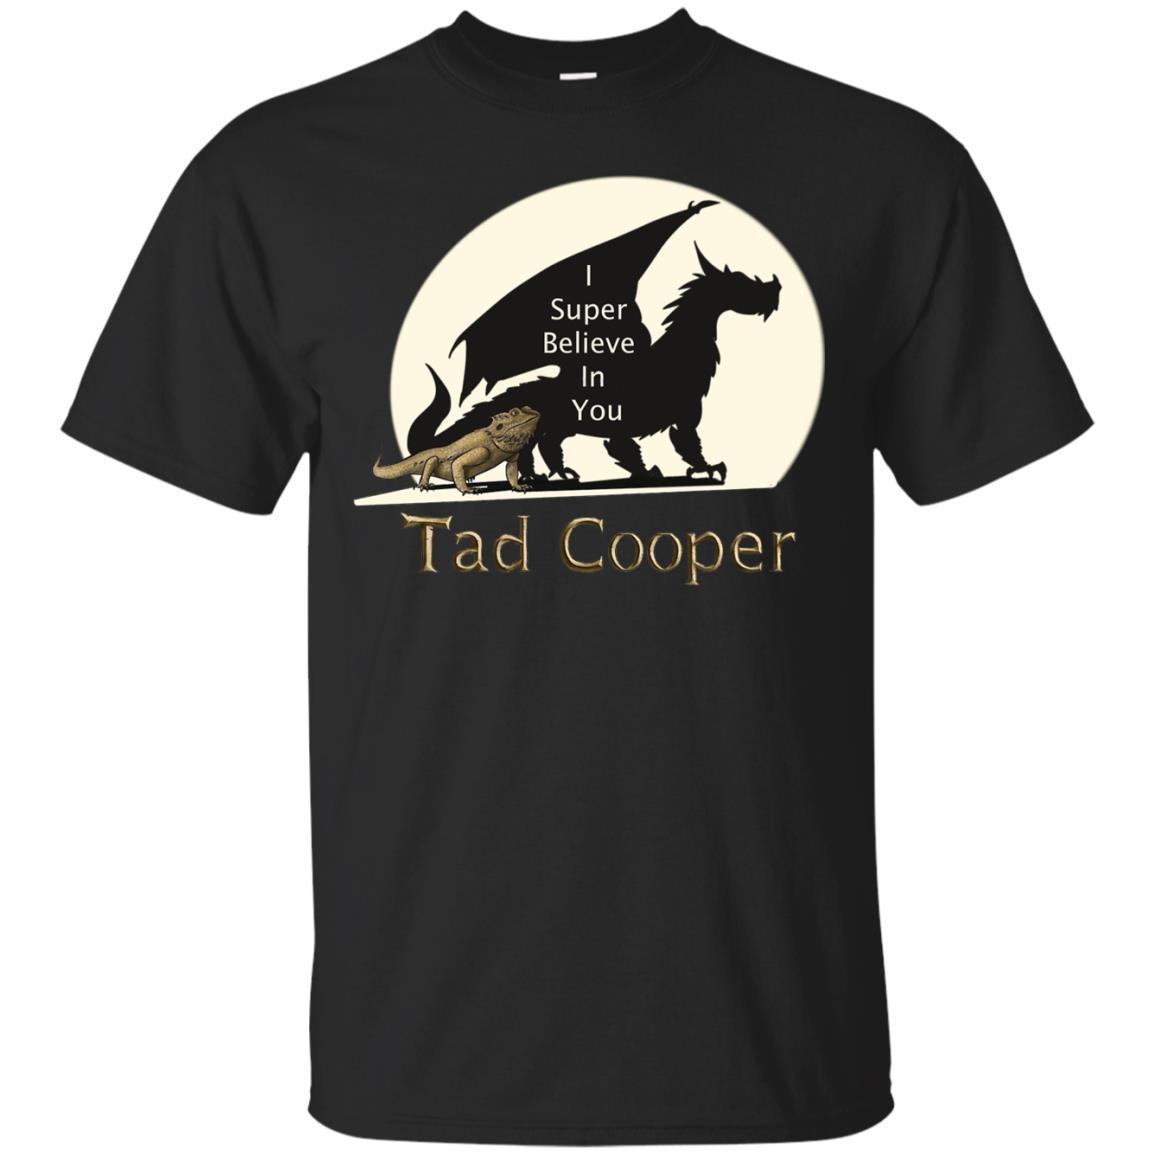 I Super Believe In You Tad Cooper T-Shirt